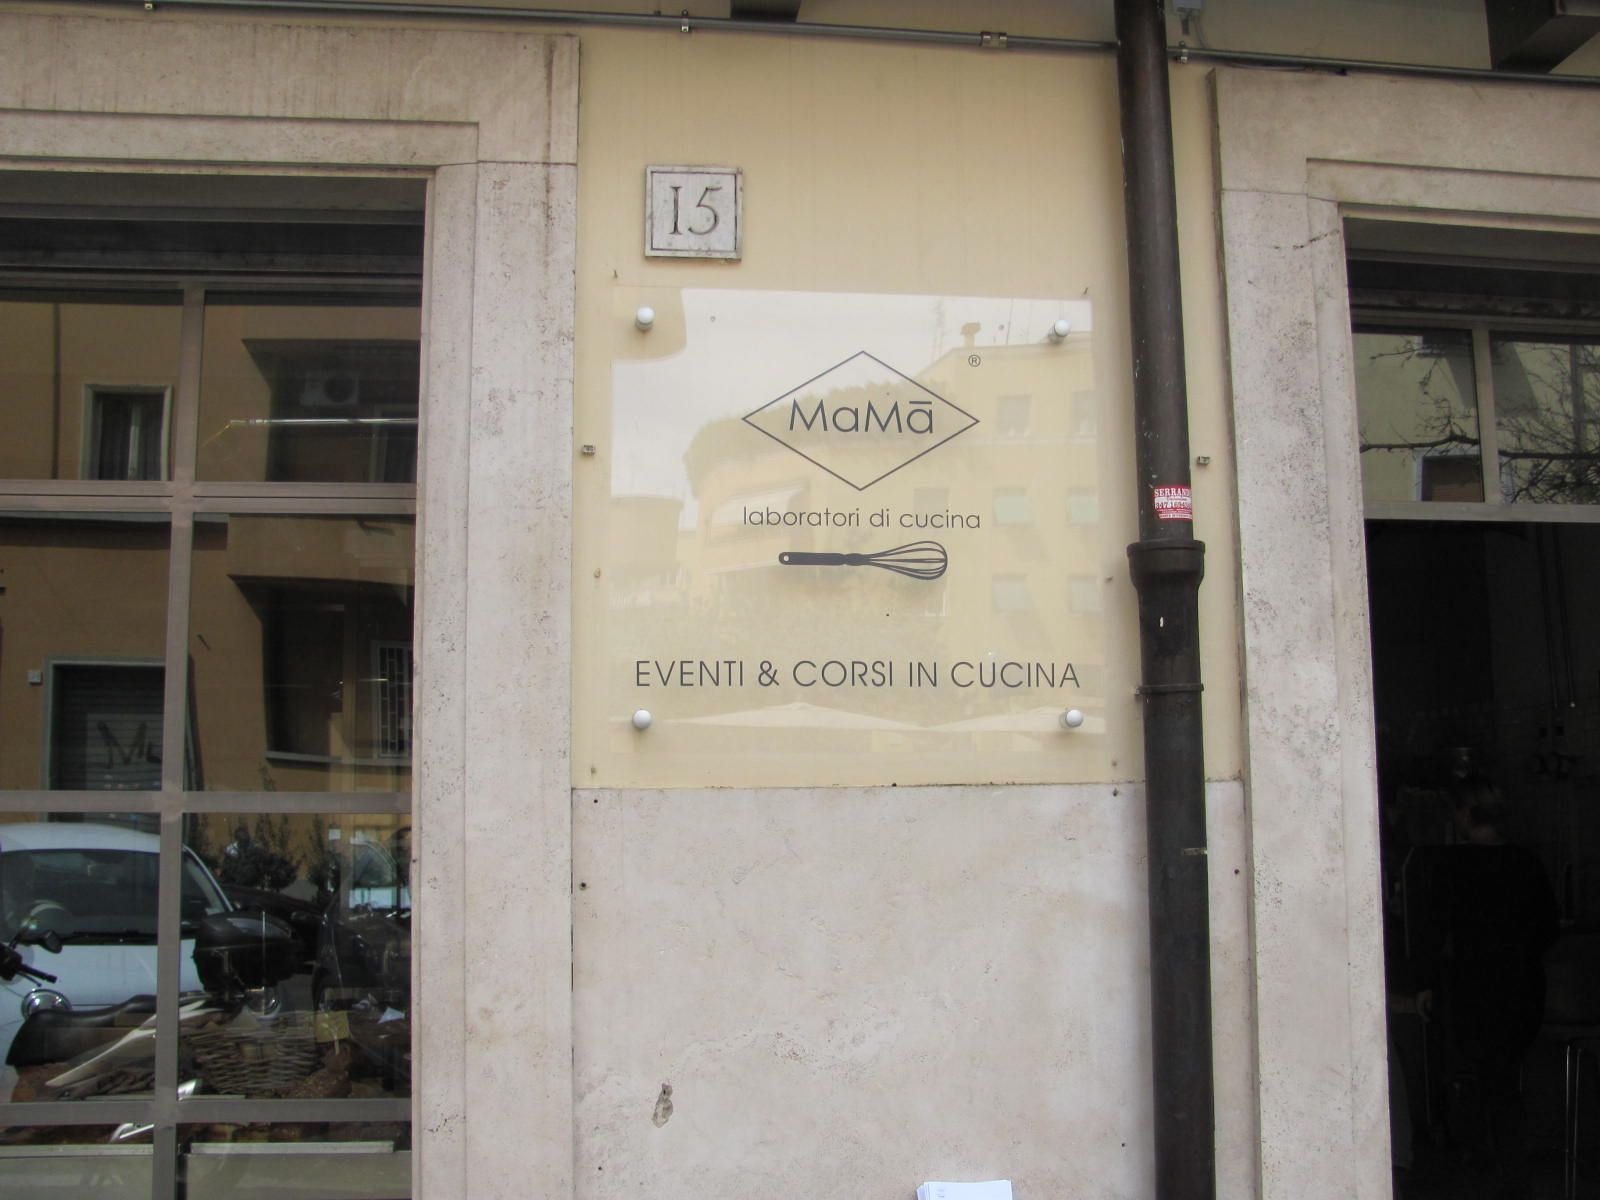 Mam laboratori di cucina a roma - Corsi di cucina genova ...